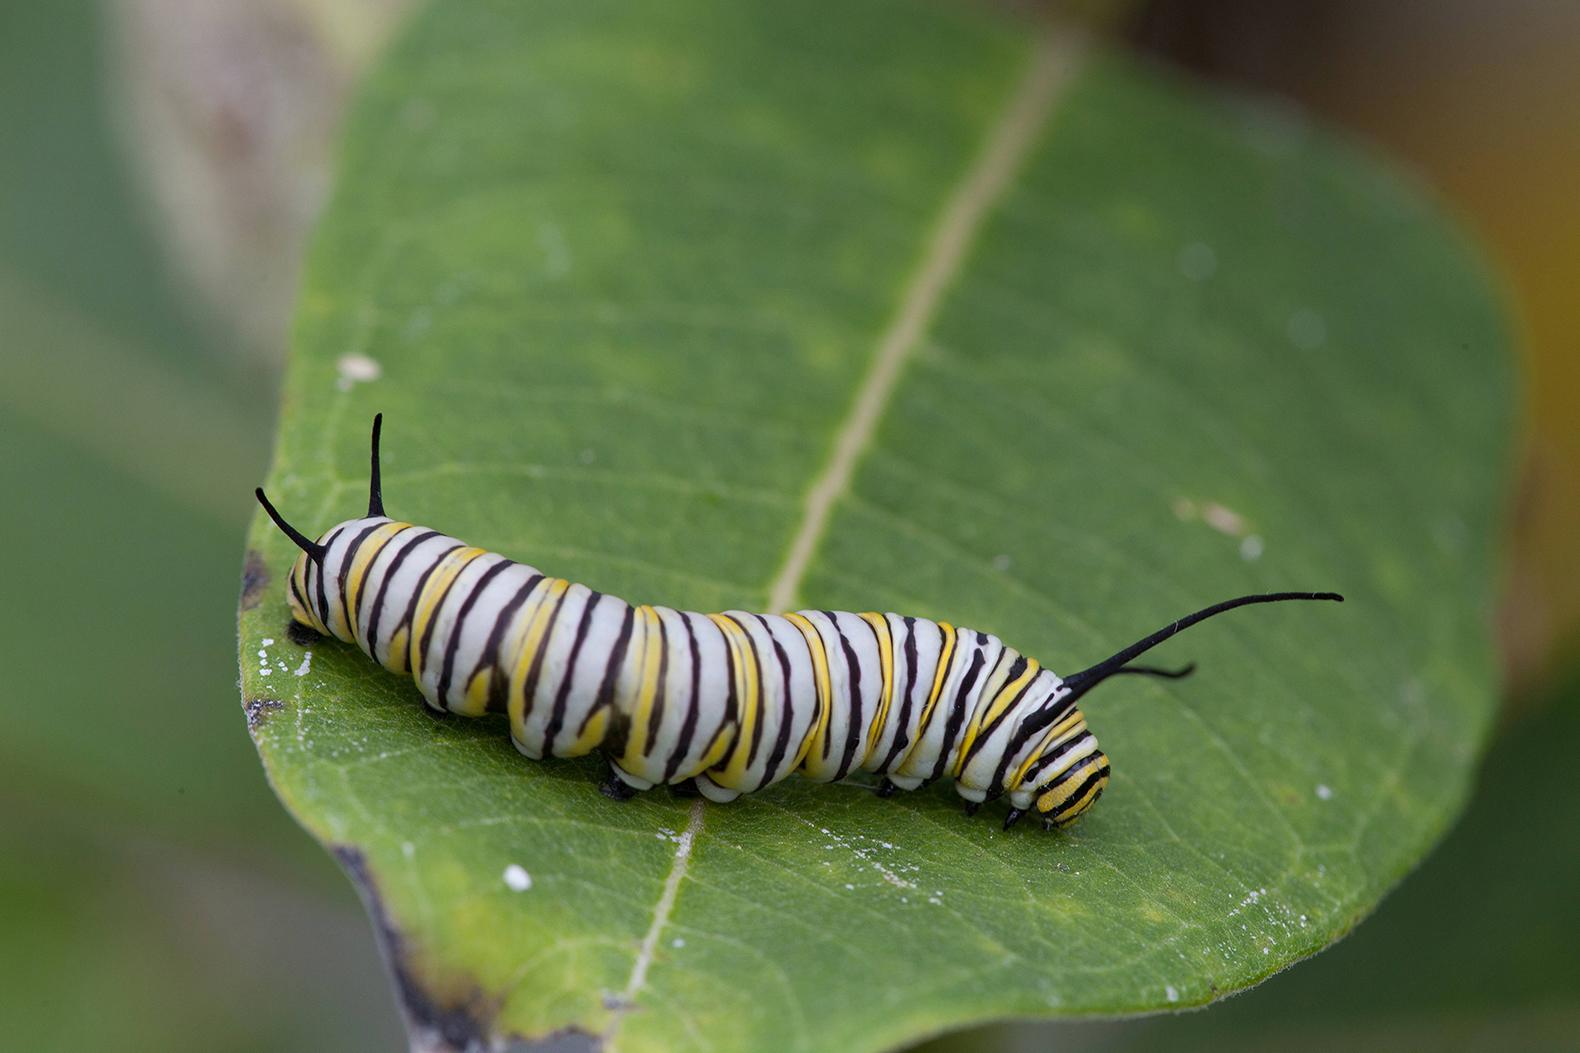 Monarch butterfly larvae feeding on milkweed. (U.S. Fish and Wildlife Service photo)